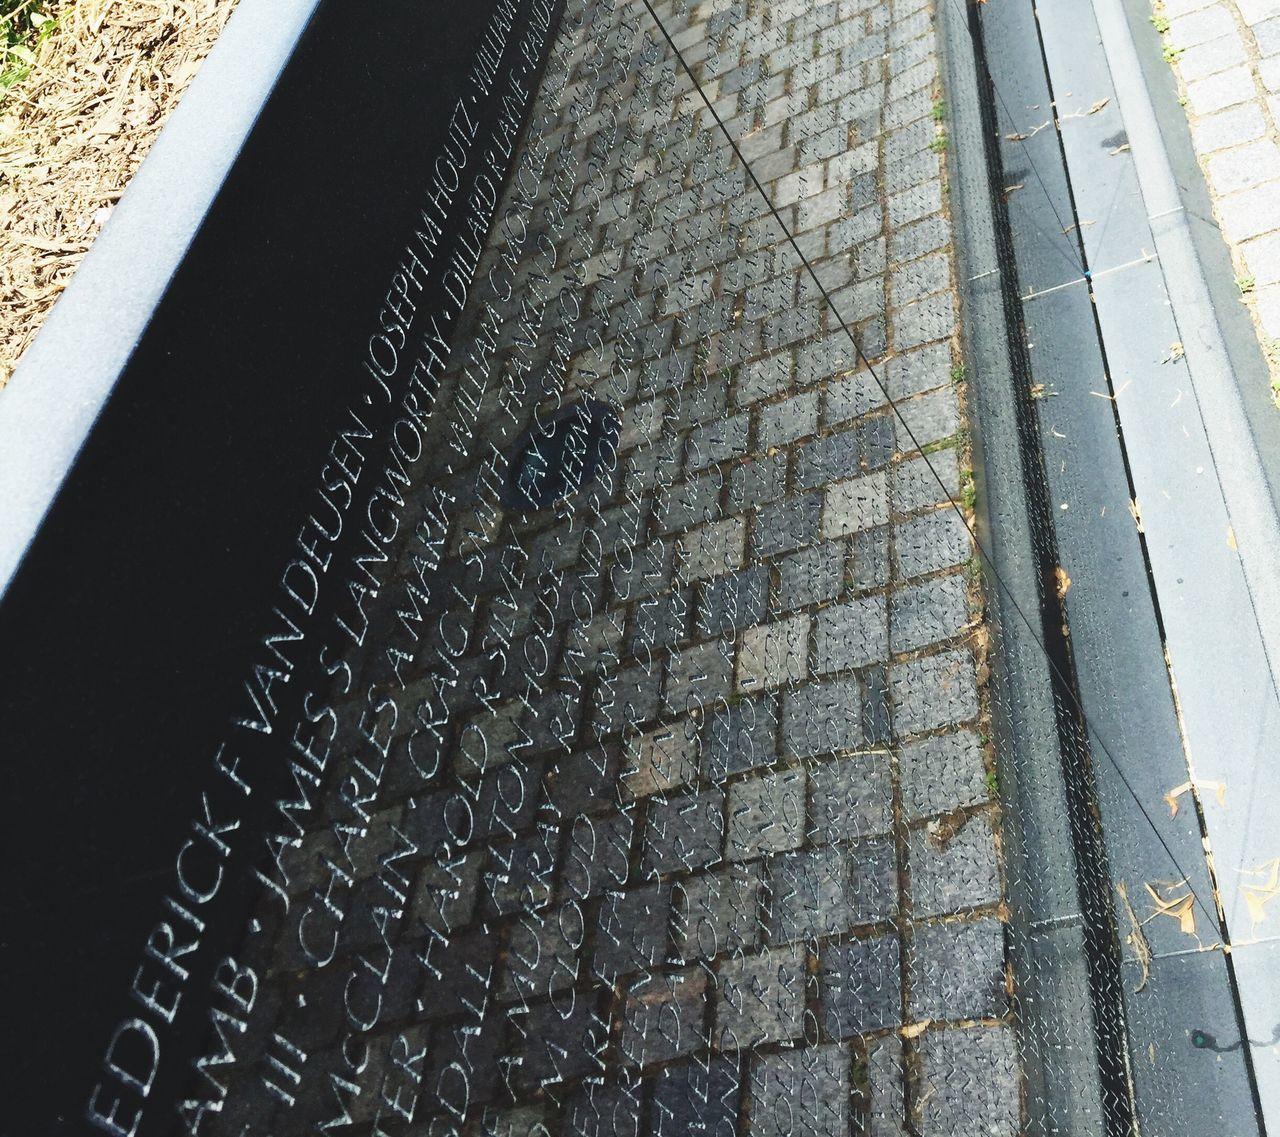 Vietnam War Memorial Washington, D. C. US Capital National Monuments Reflection Photography Stone Paved Reflection